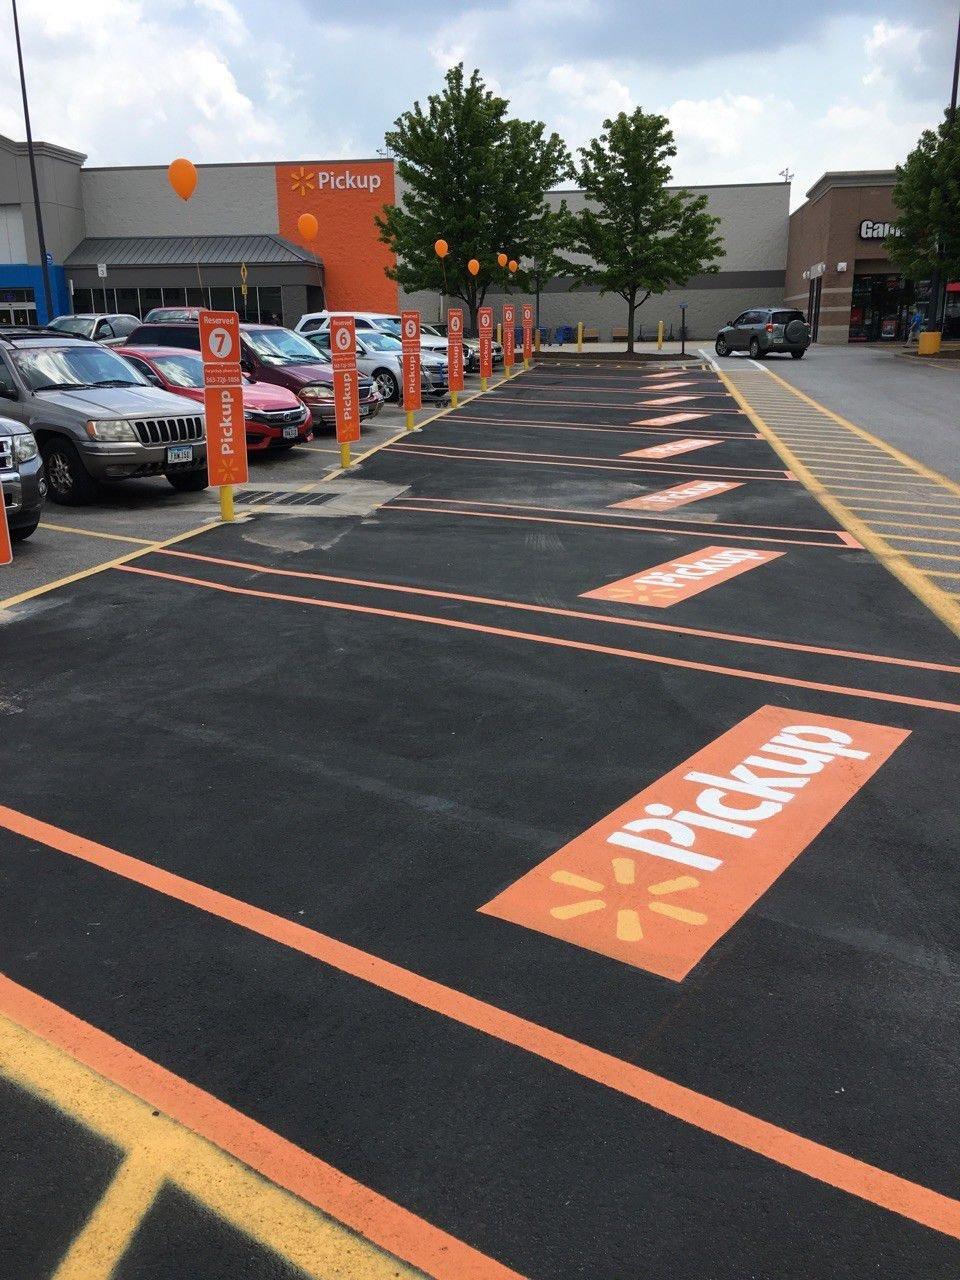 West Davenport Walmart launches pickup service | Economy